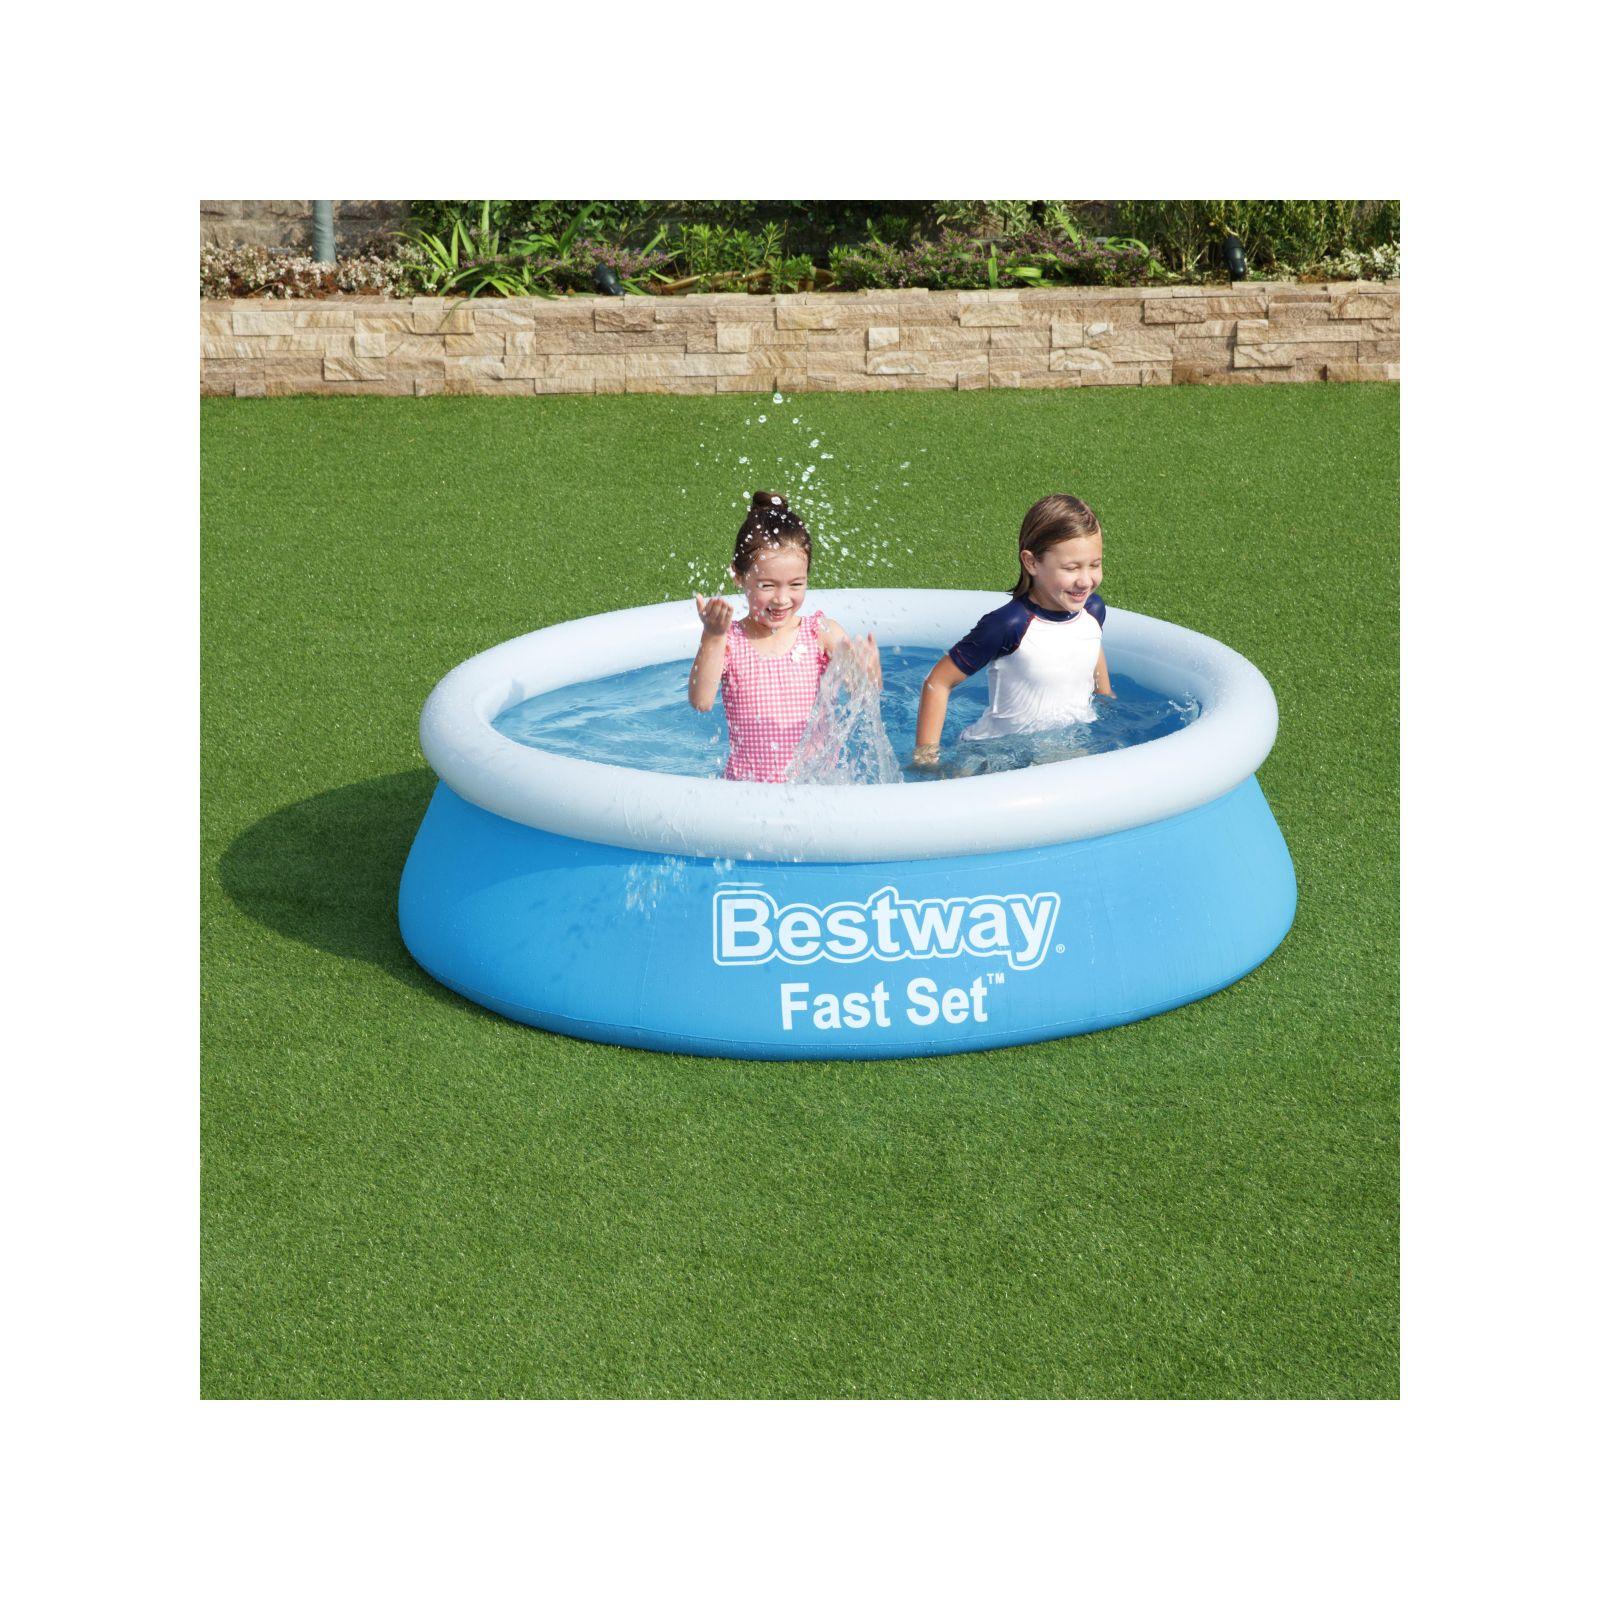 Bestway piscina fast set 183x51 cm -